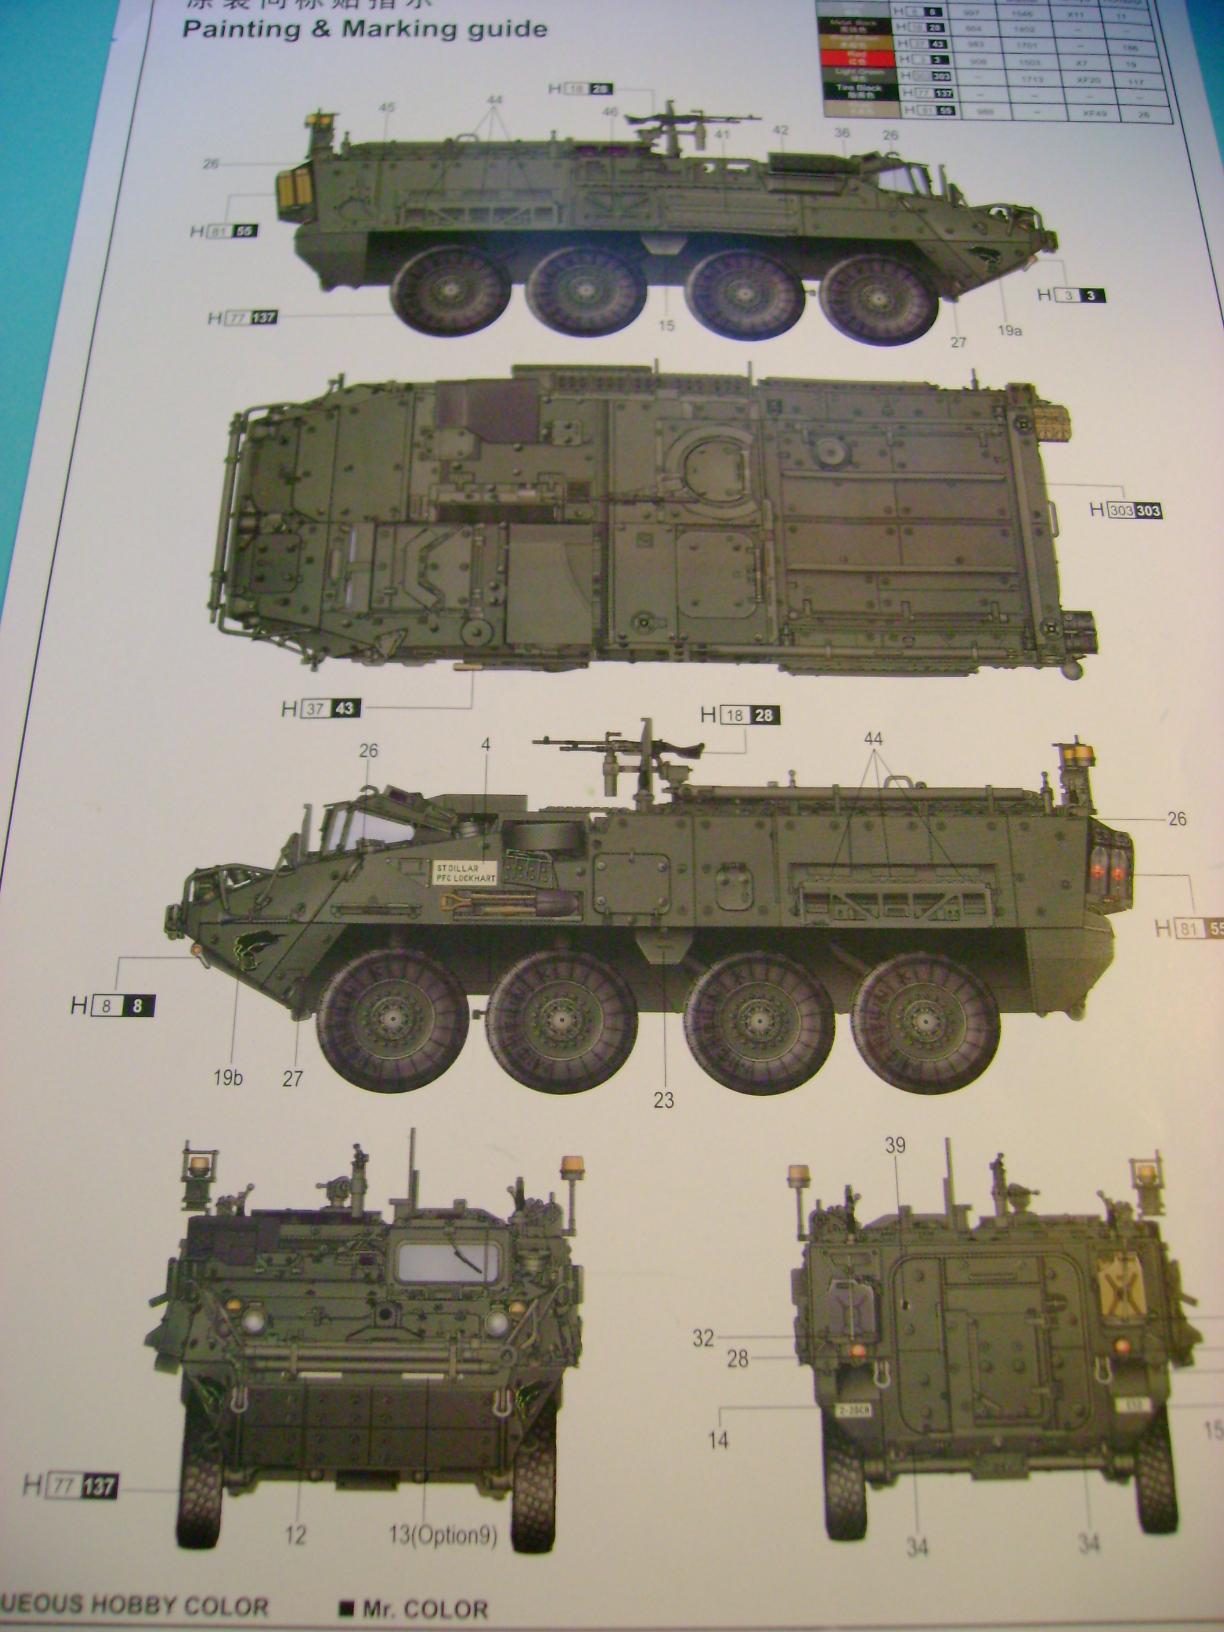 Review Kit M1129 Stryker Mortar Carrier Vehicle MC-B Trumpeter 1/35... Dsc02270j